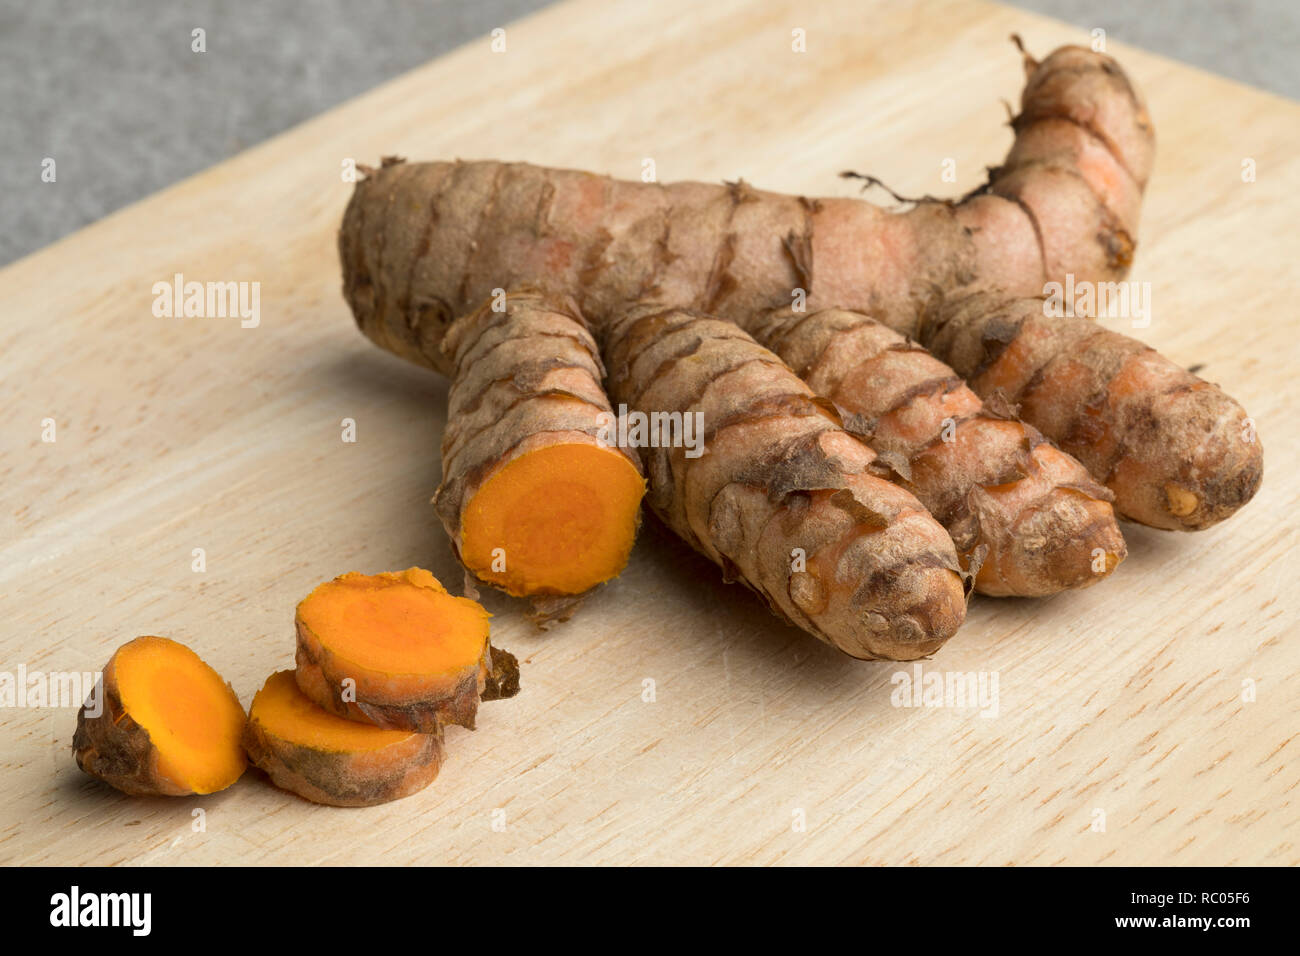 Fresh raw curcuma rhizome and slices close up - Stock Image